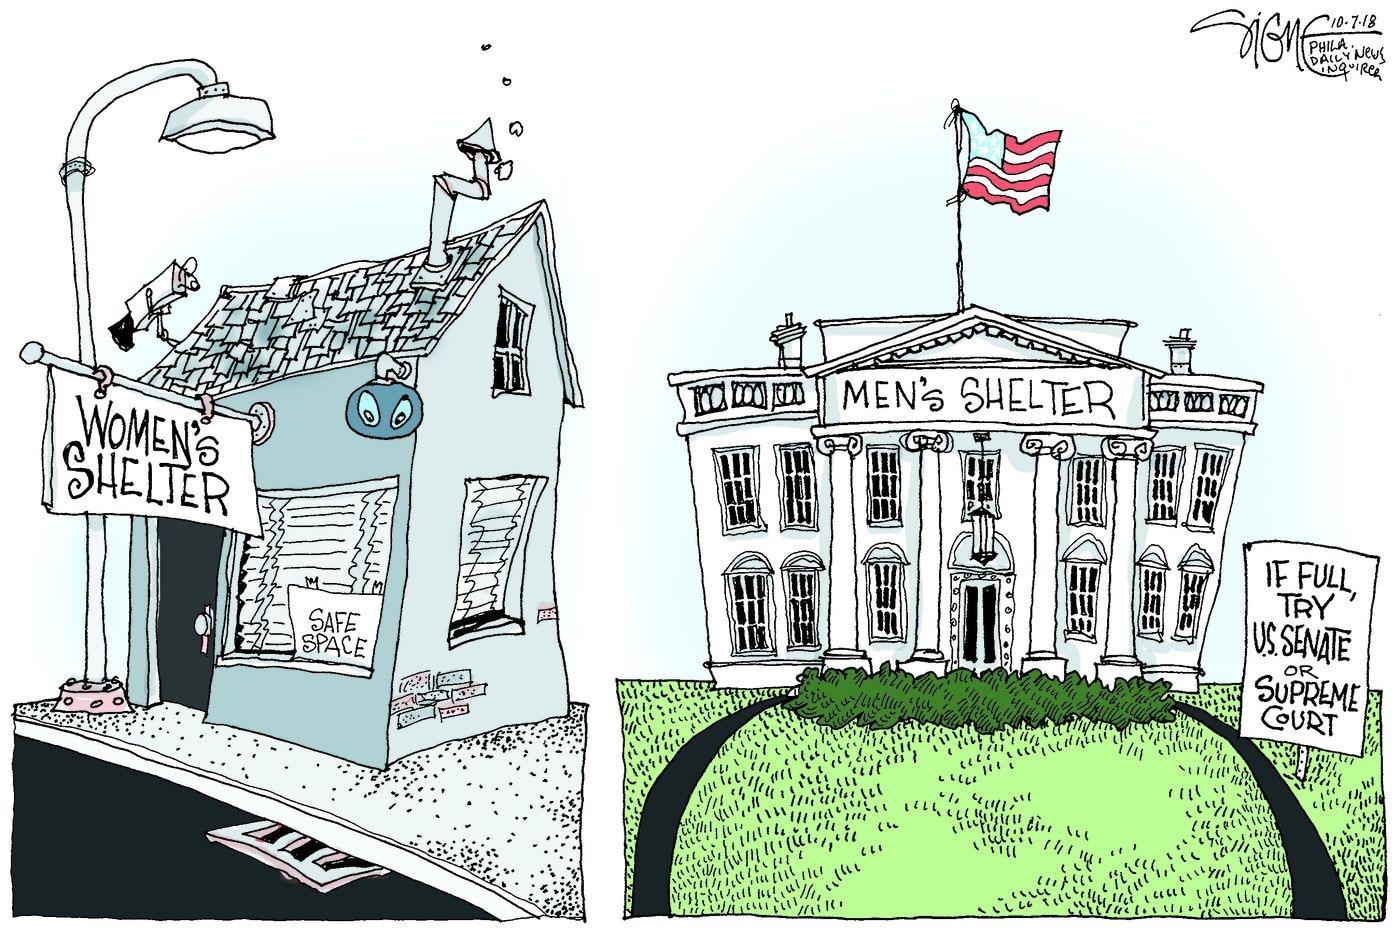 Daily Signe Cartoon 10/07/18